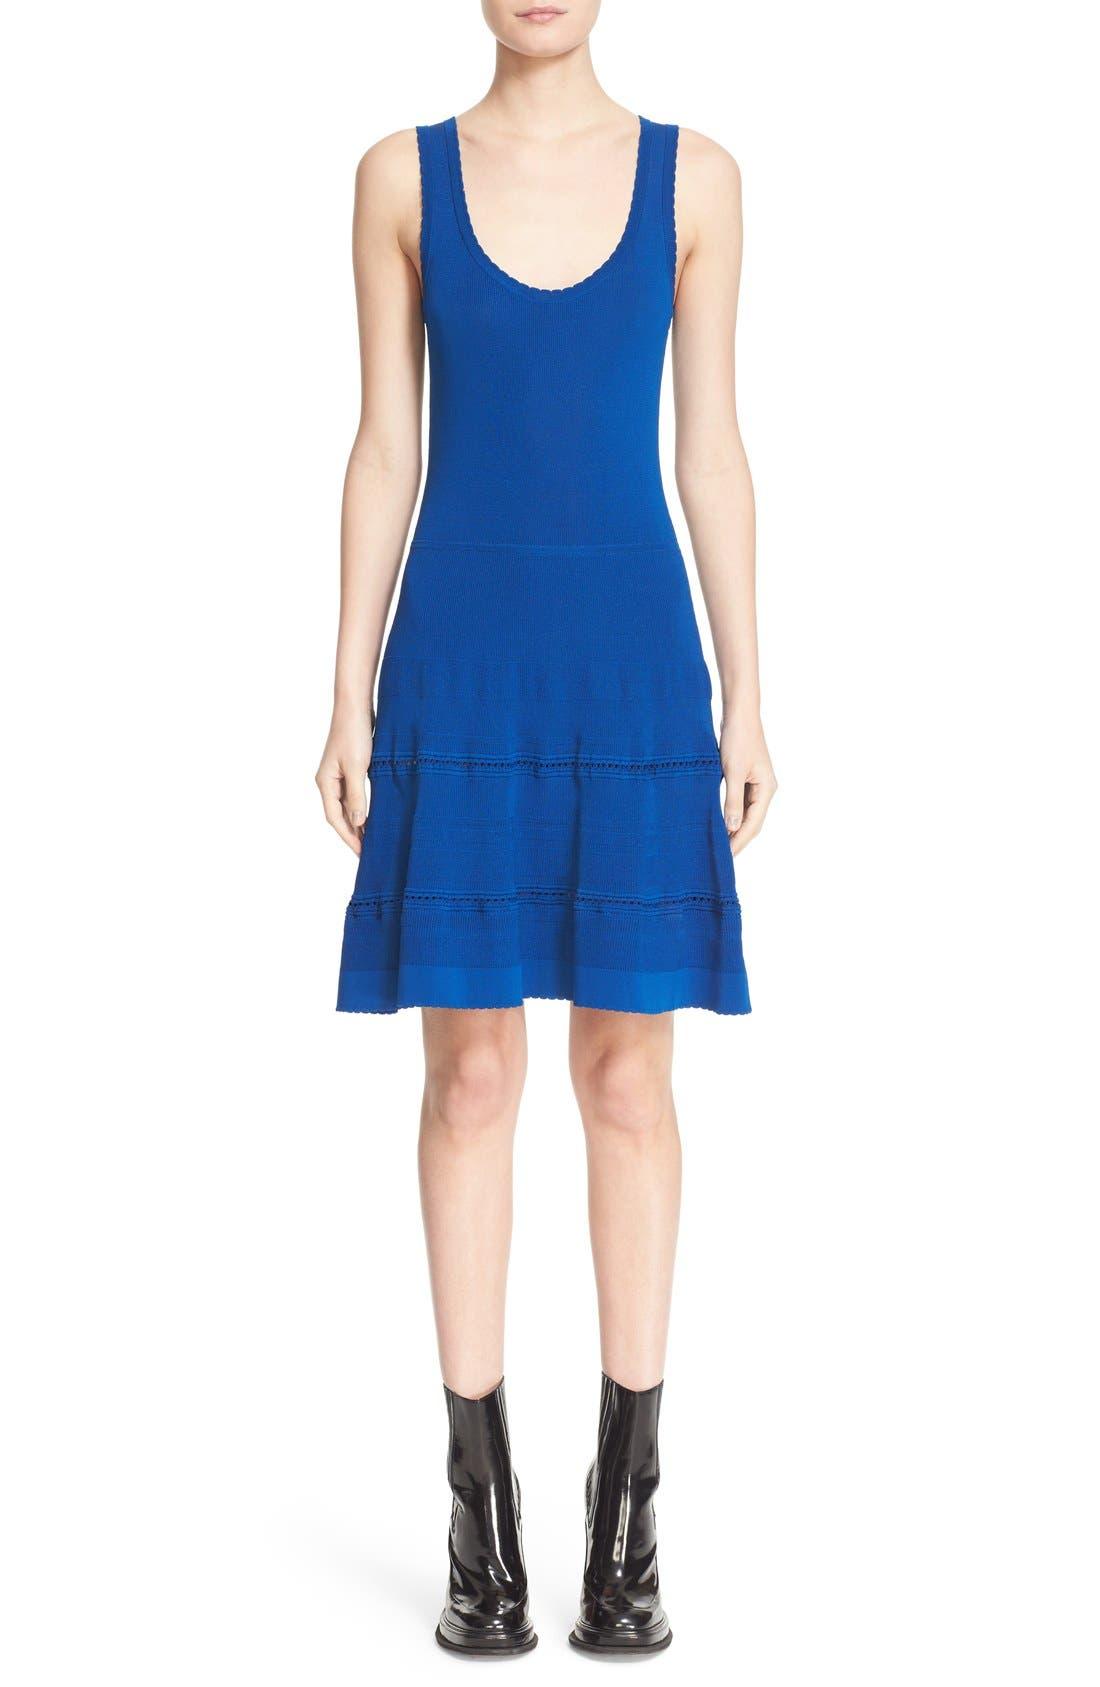 Alternate Image 1 Selected - Carven Stretch Knit Fit & Flare Dress